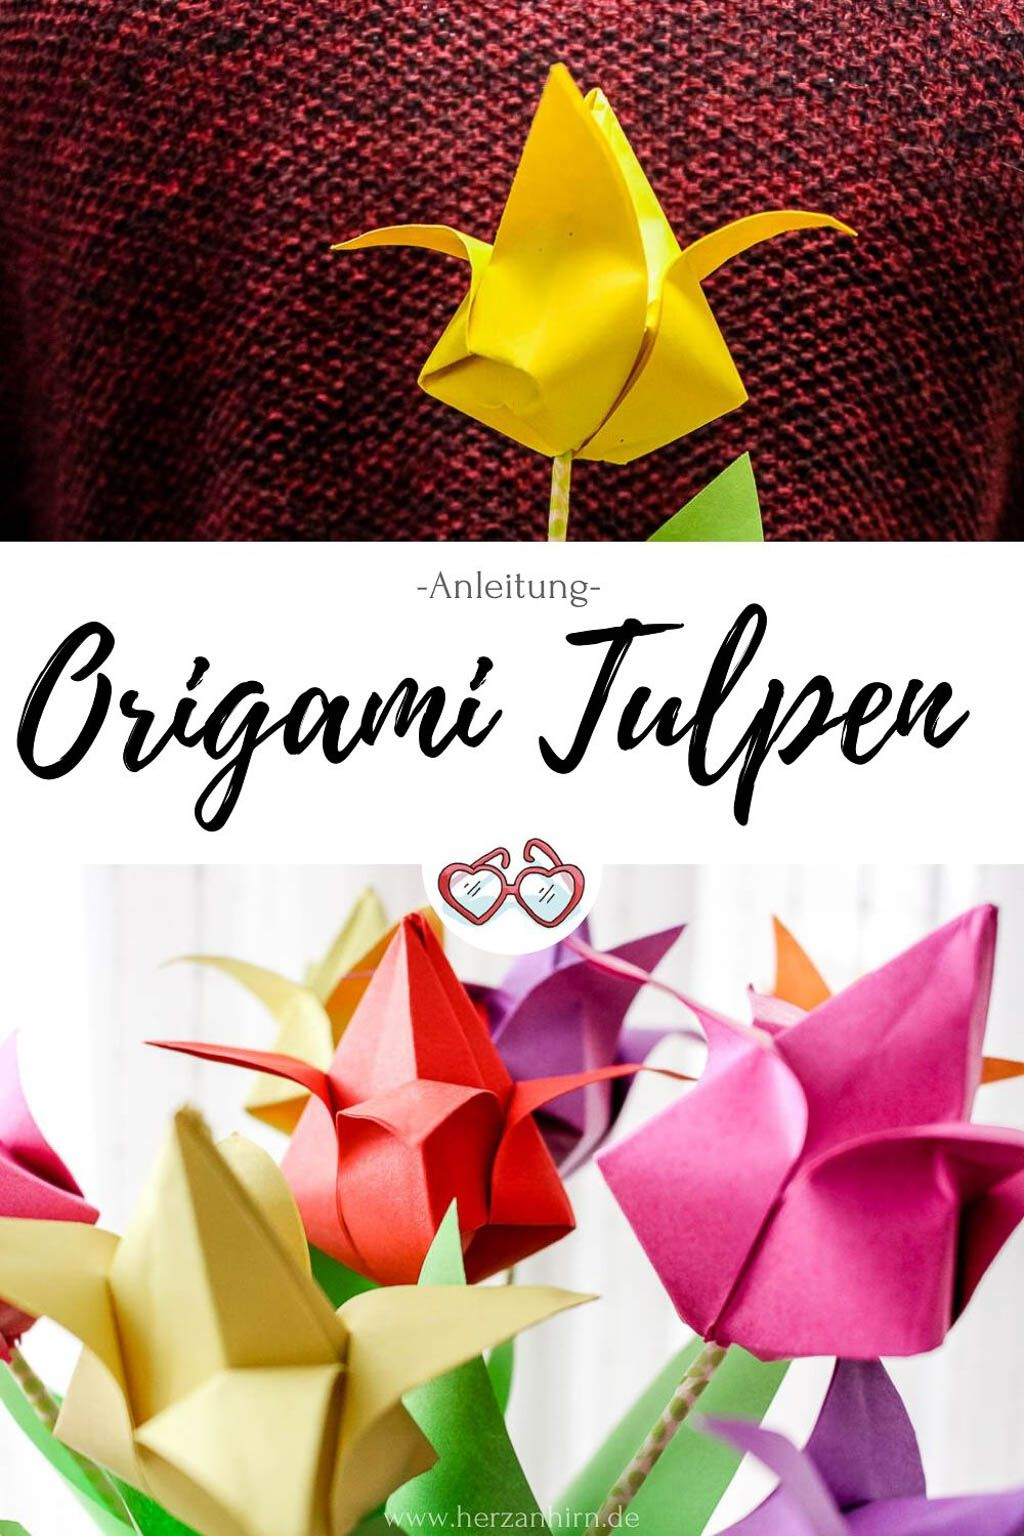 Origami Tulpen aus Papier falten - DIY-Anleitung zum Selbermachen